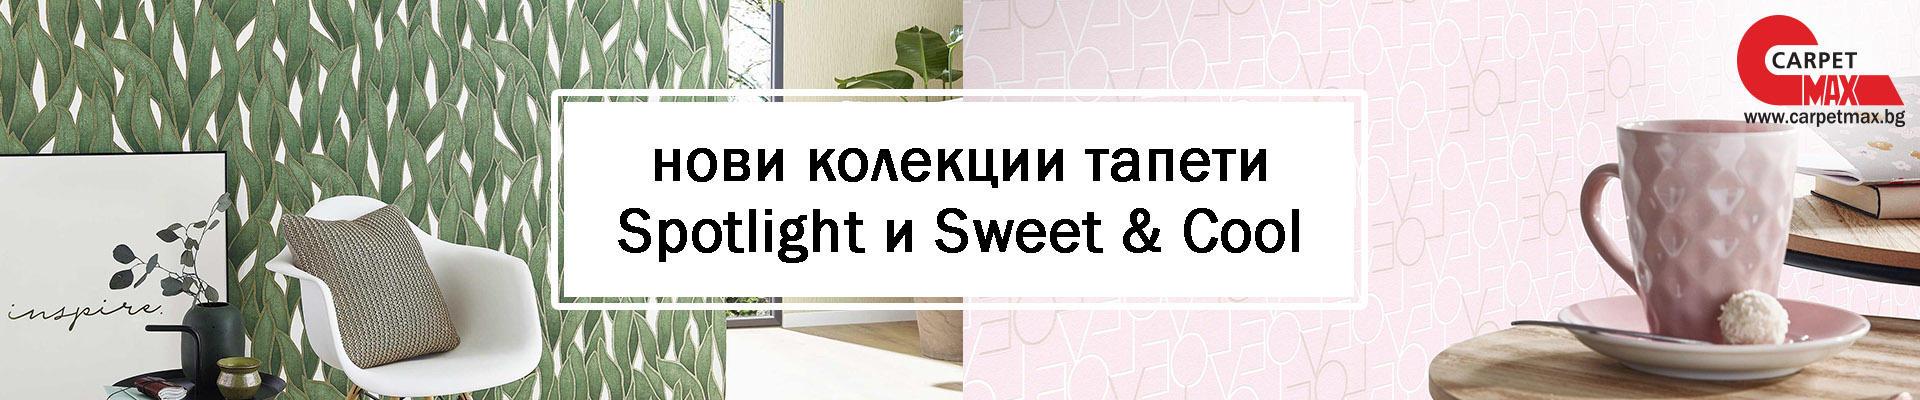 Нови колекции тапети Spotlight и Sweet & Cool